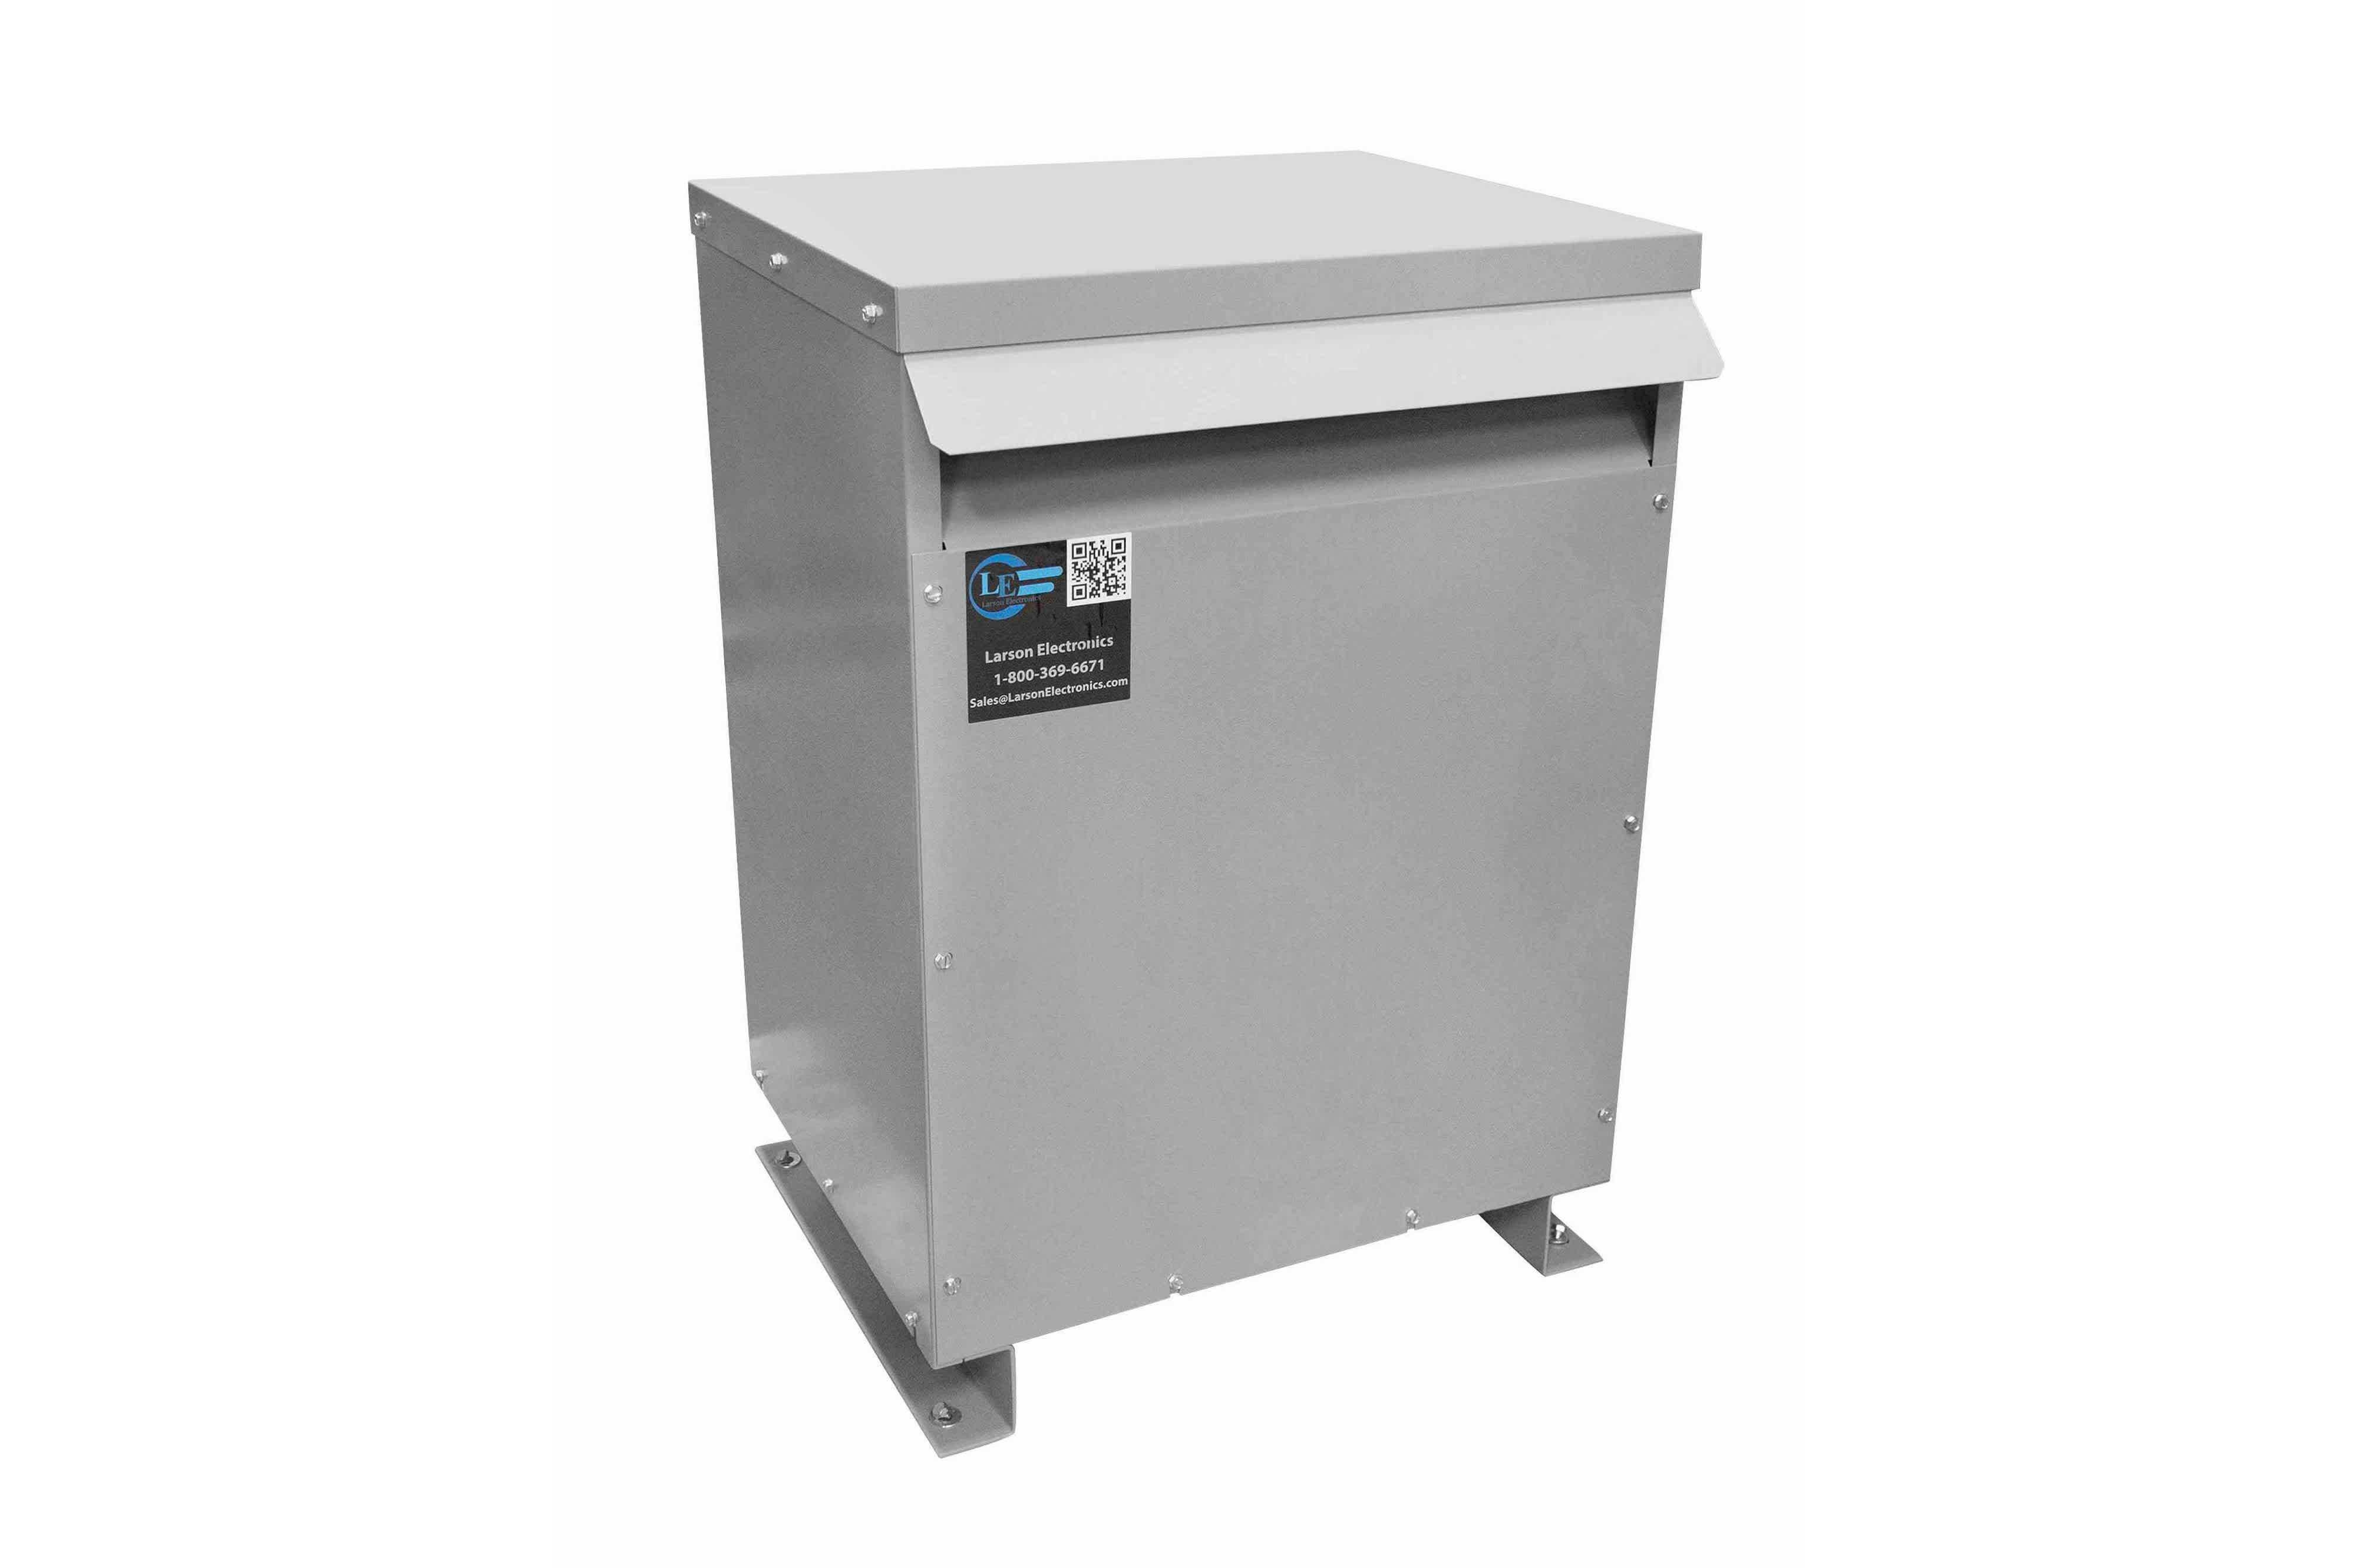 14 kVA 3PH Isolation Transformer, 415V Wye Primary, 600V Delta Secondary, N3R, Ventilated, 60 Hz